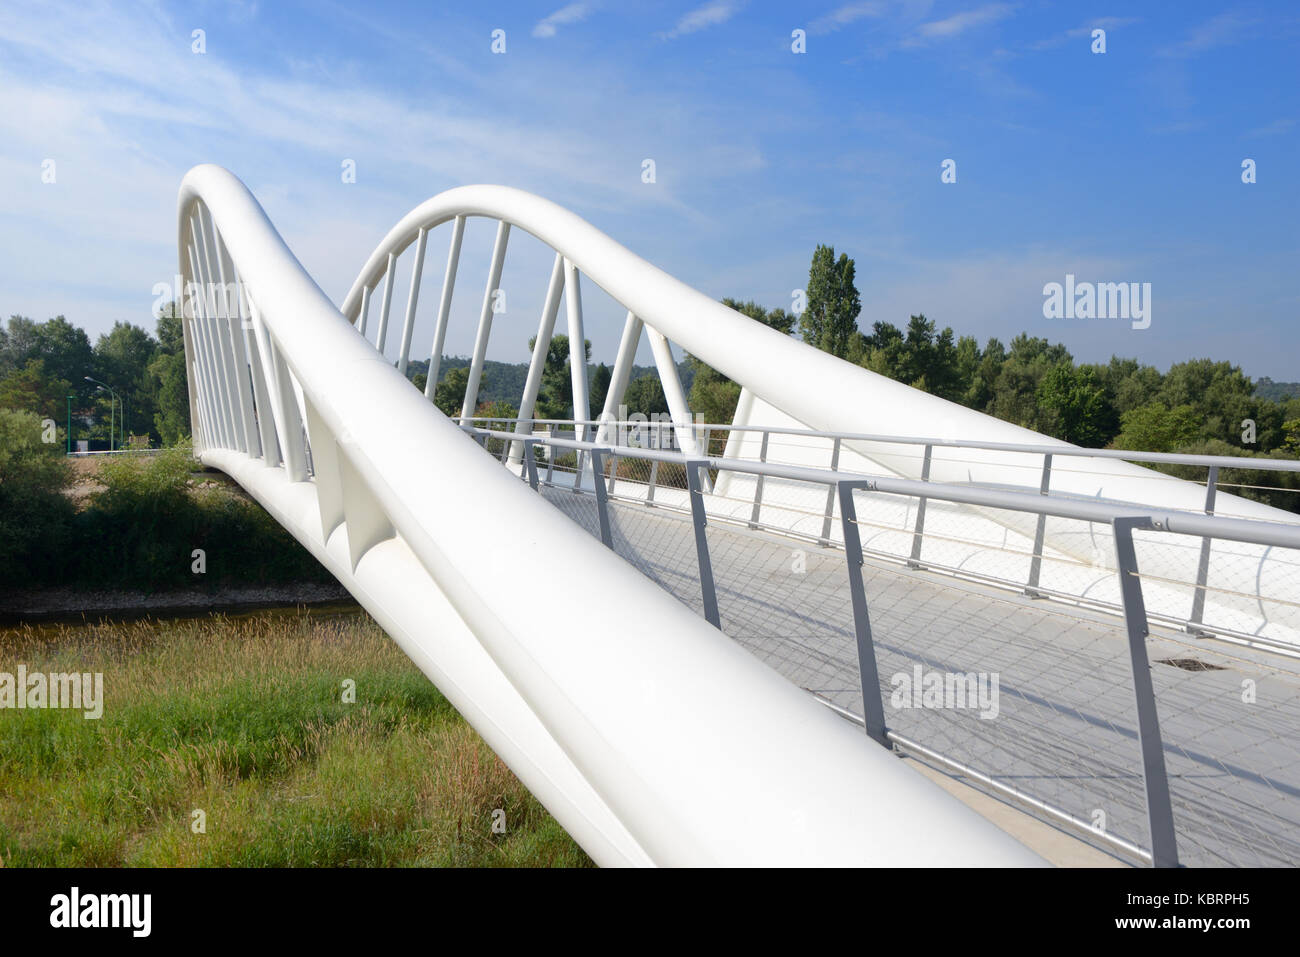 Zeitgenössischer Stil kurvenförmige Stahl Fußgängerbrücke über den ...